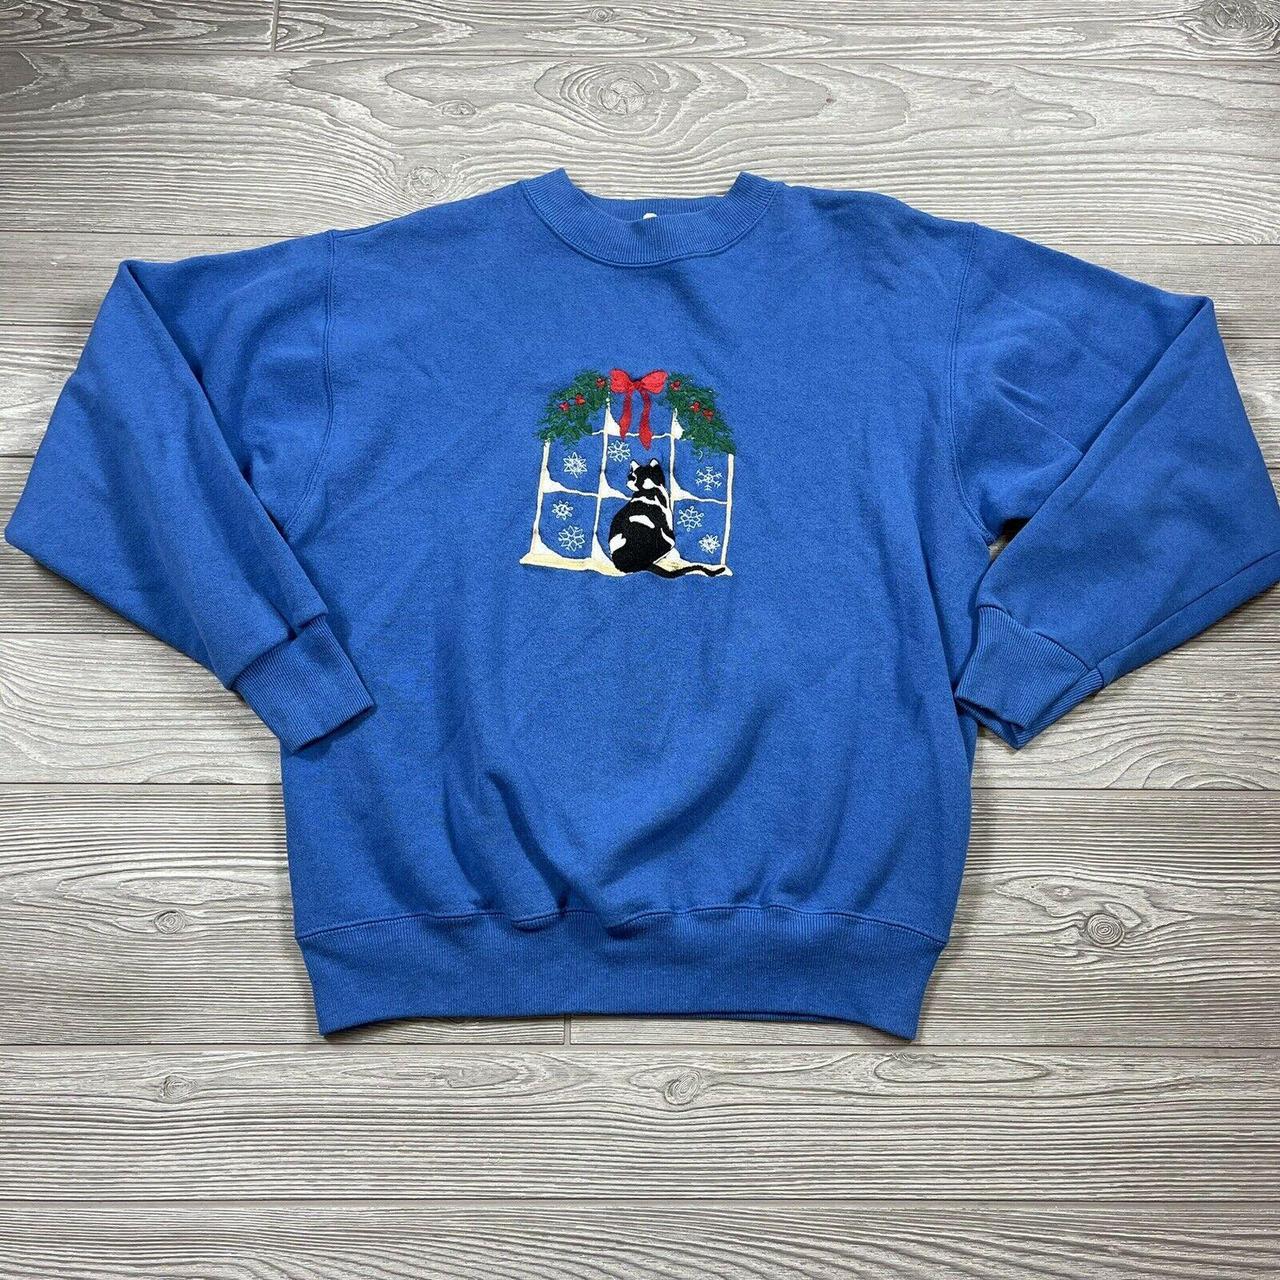 Product Image 1 - Vintage Kitty Cat Sweatshirt Womens